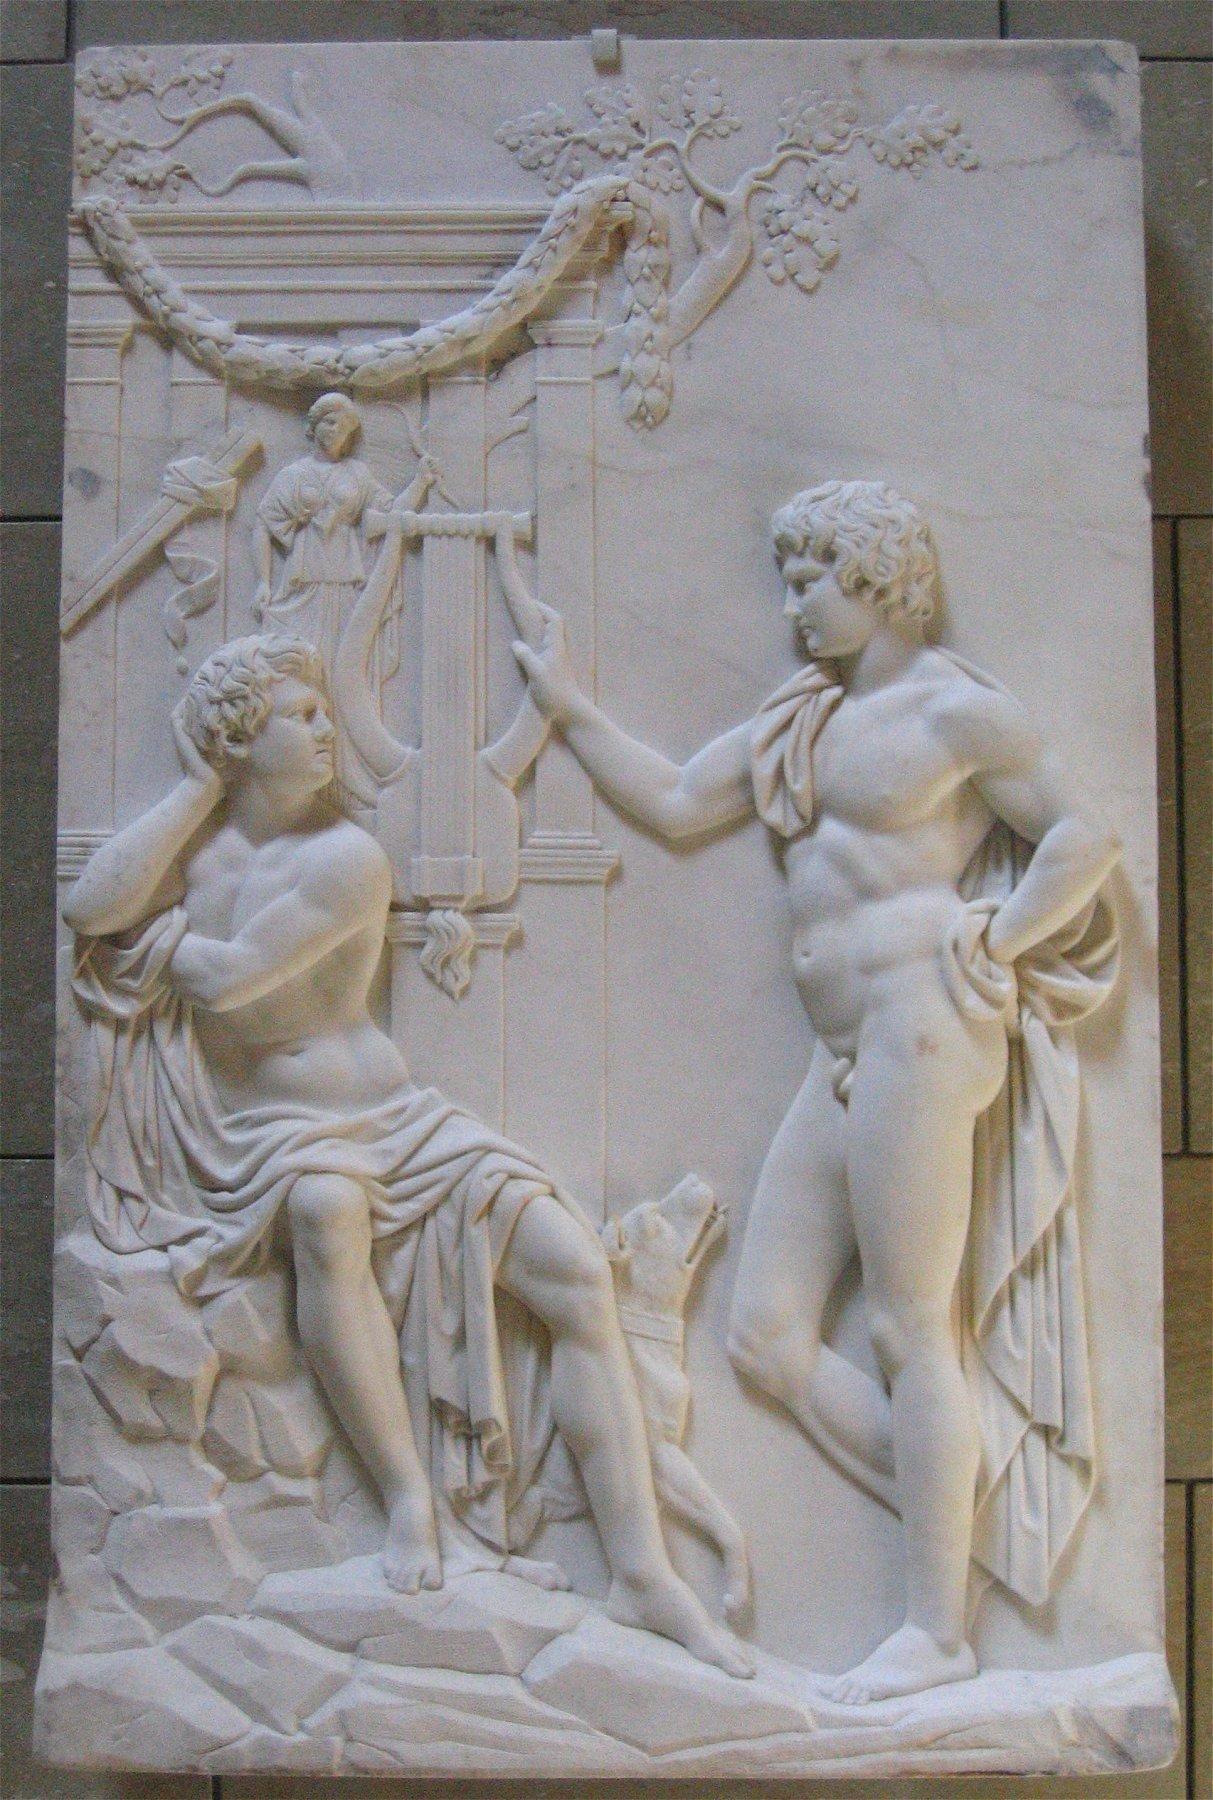 Theban kings in Greek mythology